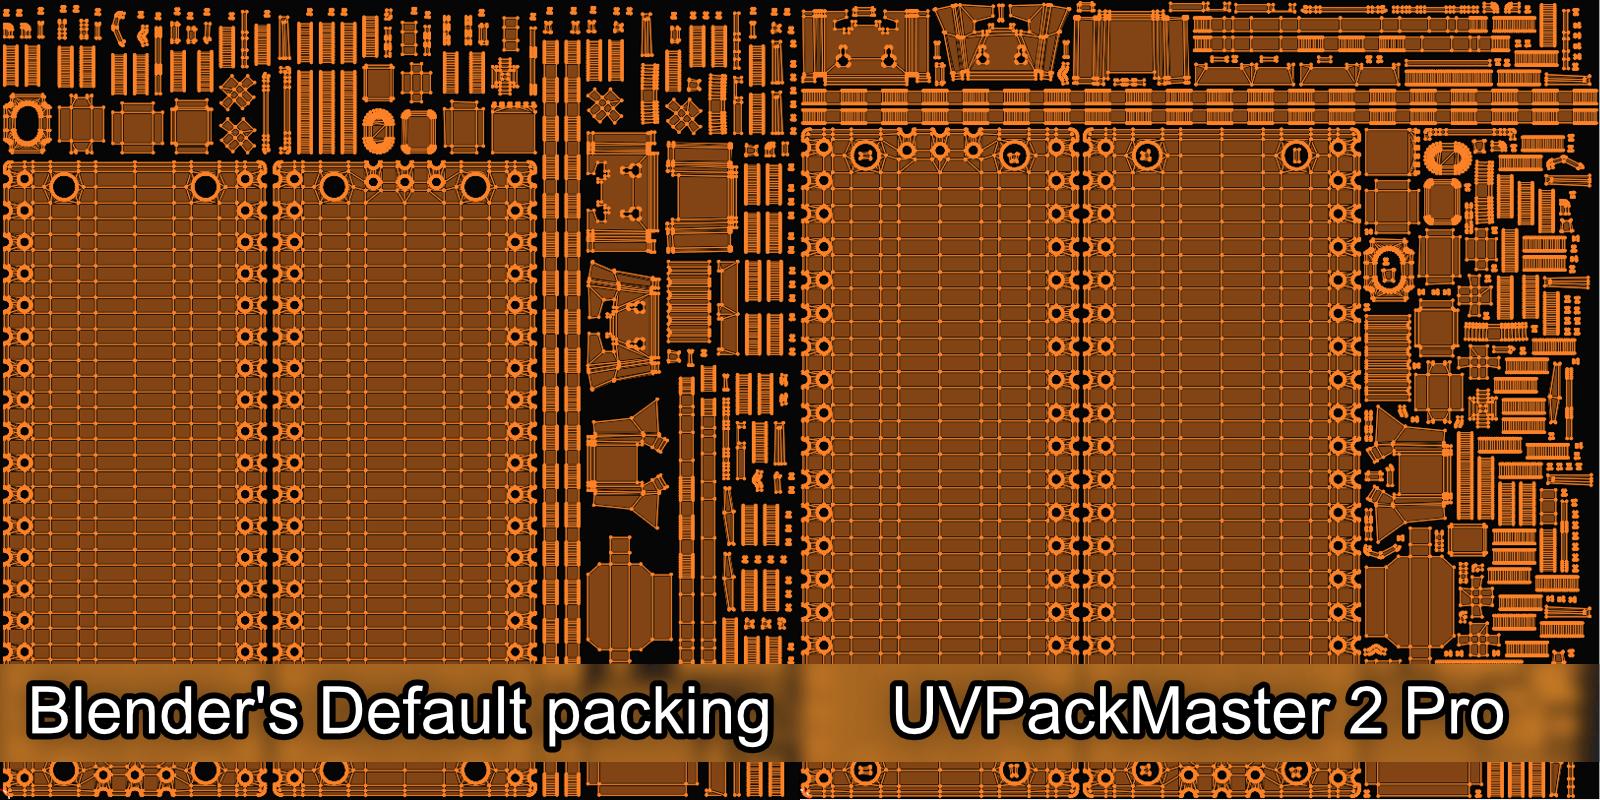 uv packmaster pro